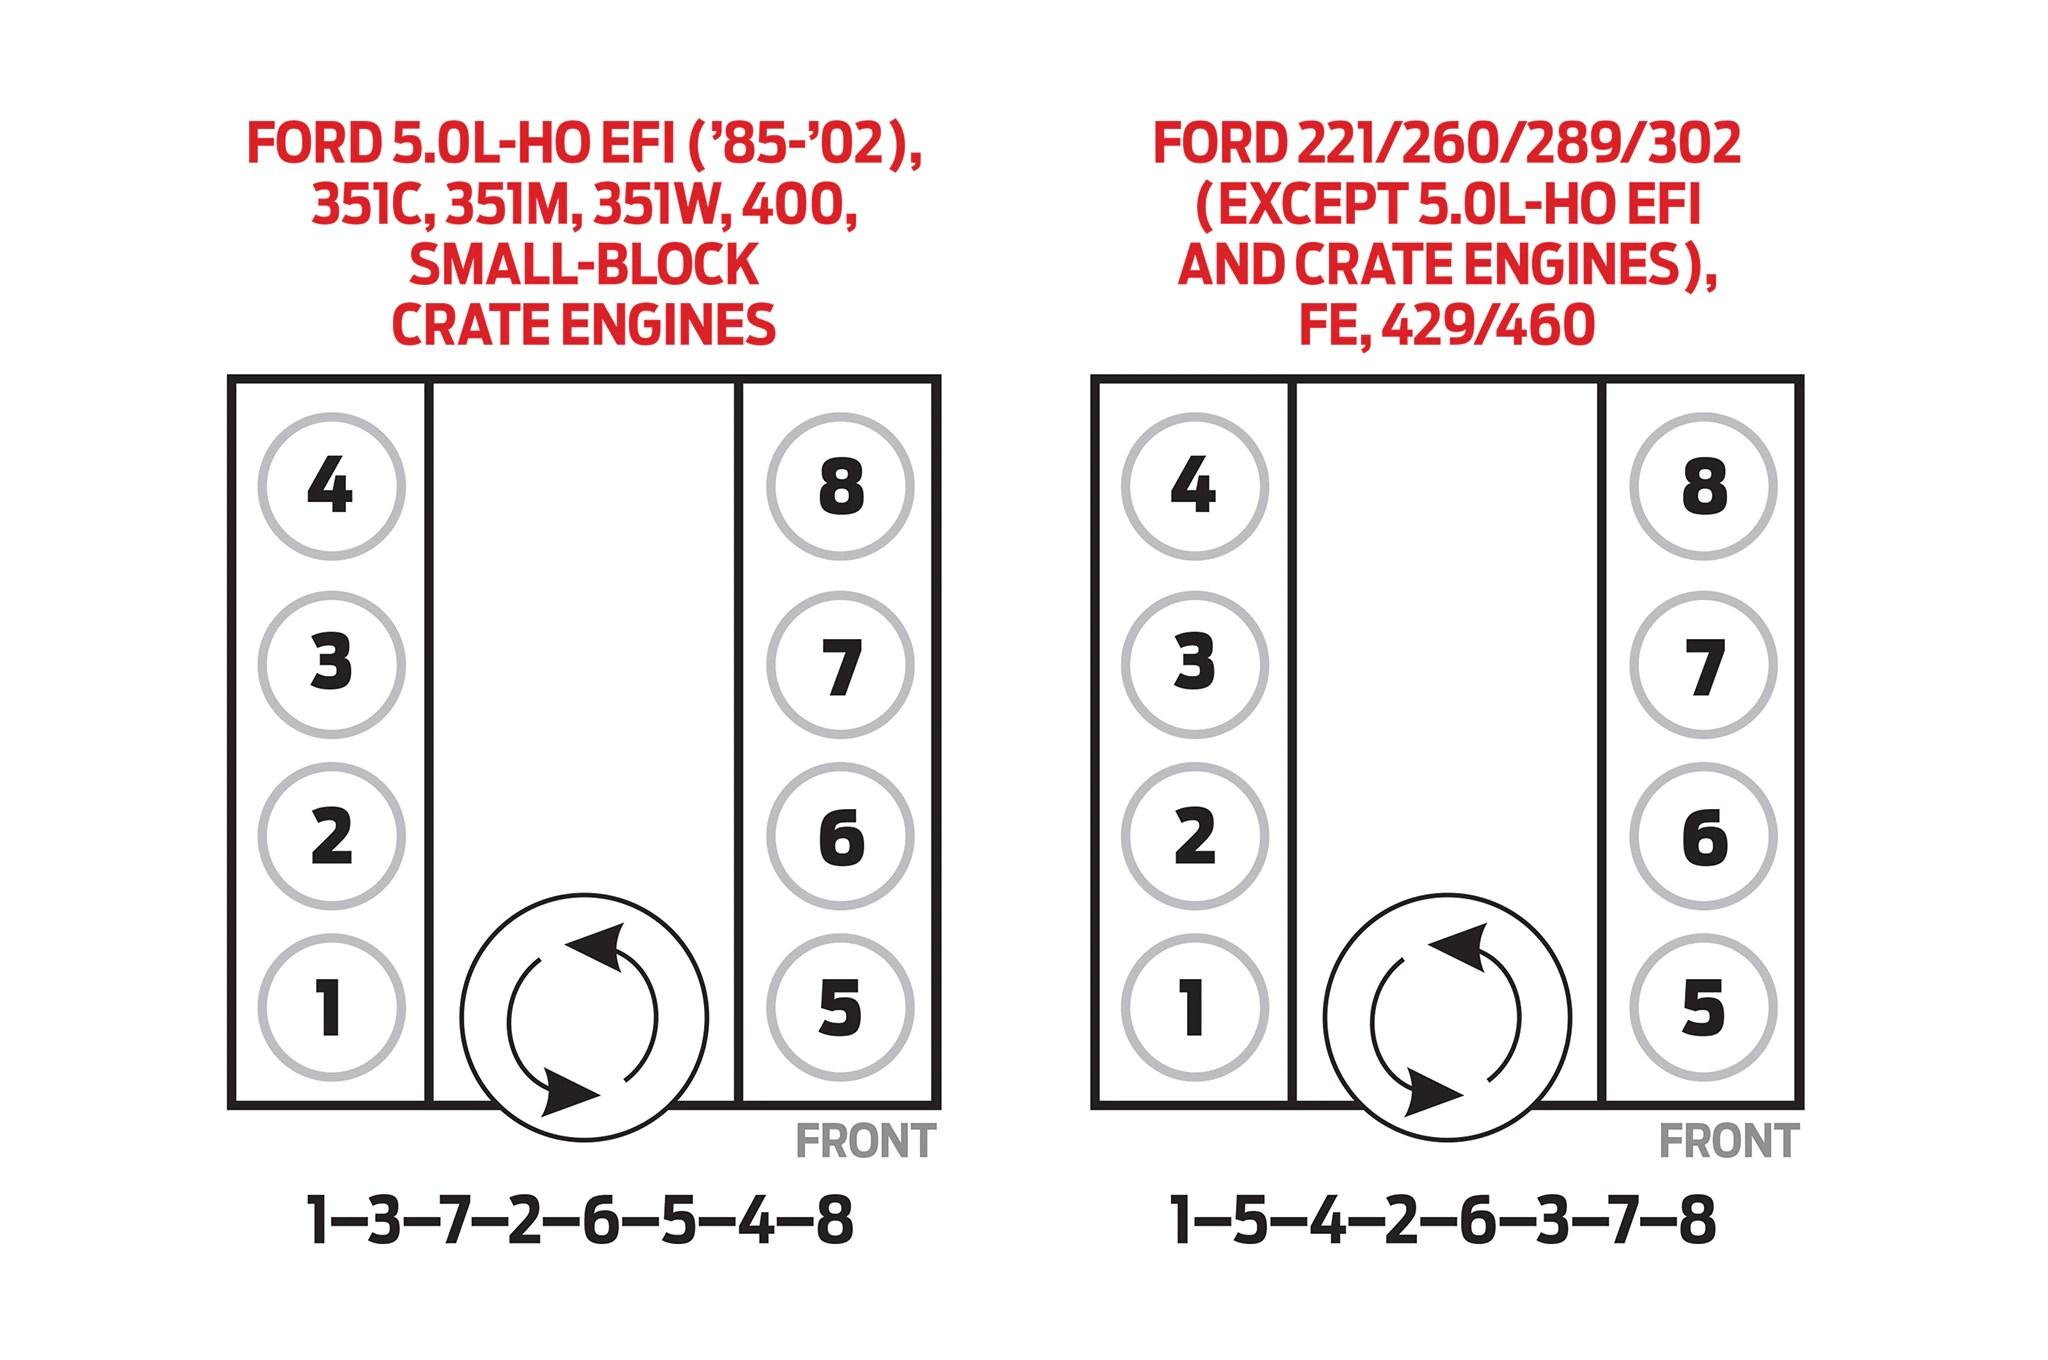 medium resolution of mustang 5 0 ho firing order diagram further ford mustang wiring ford 4 0 firing order diagram 1993 ford 5 0 firing order ford